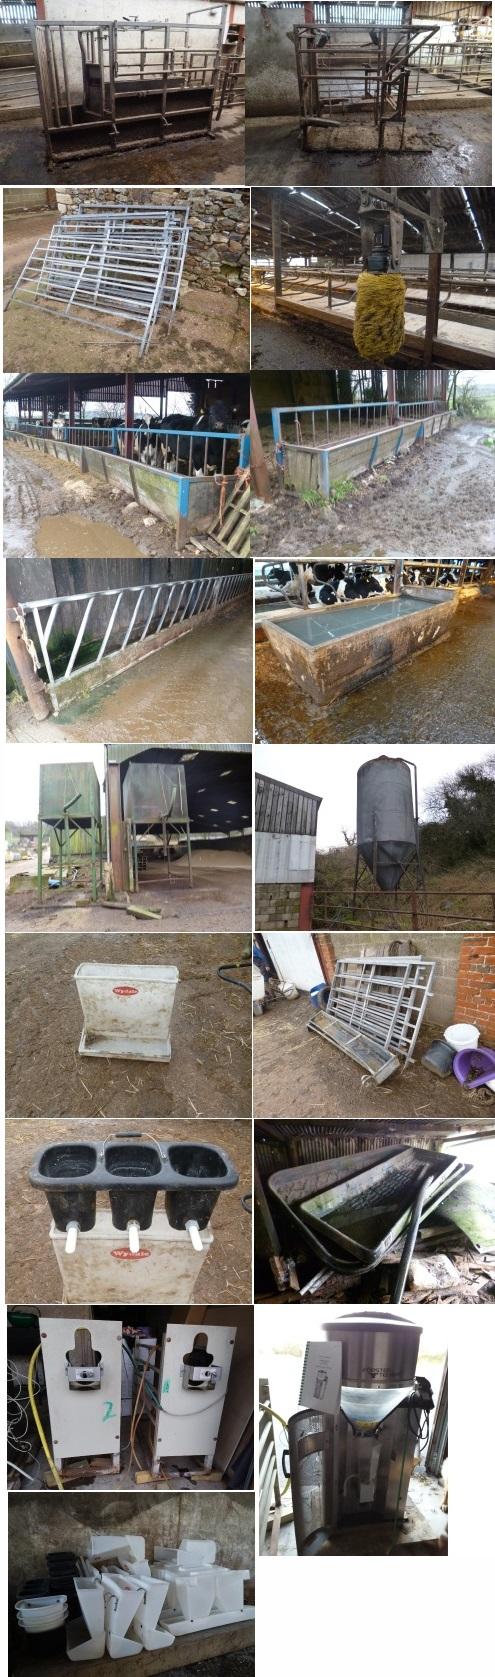 Shermans Farm, Gittisham, Honiton EX14 3AU